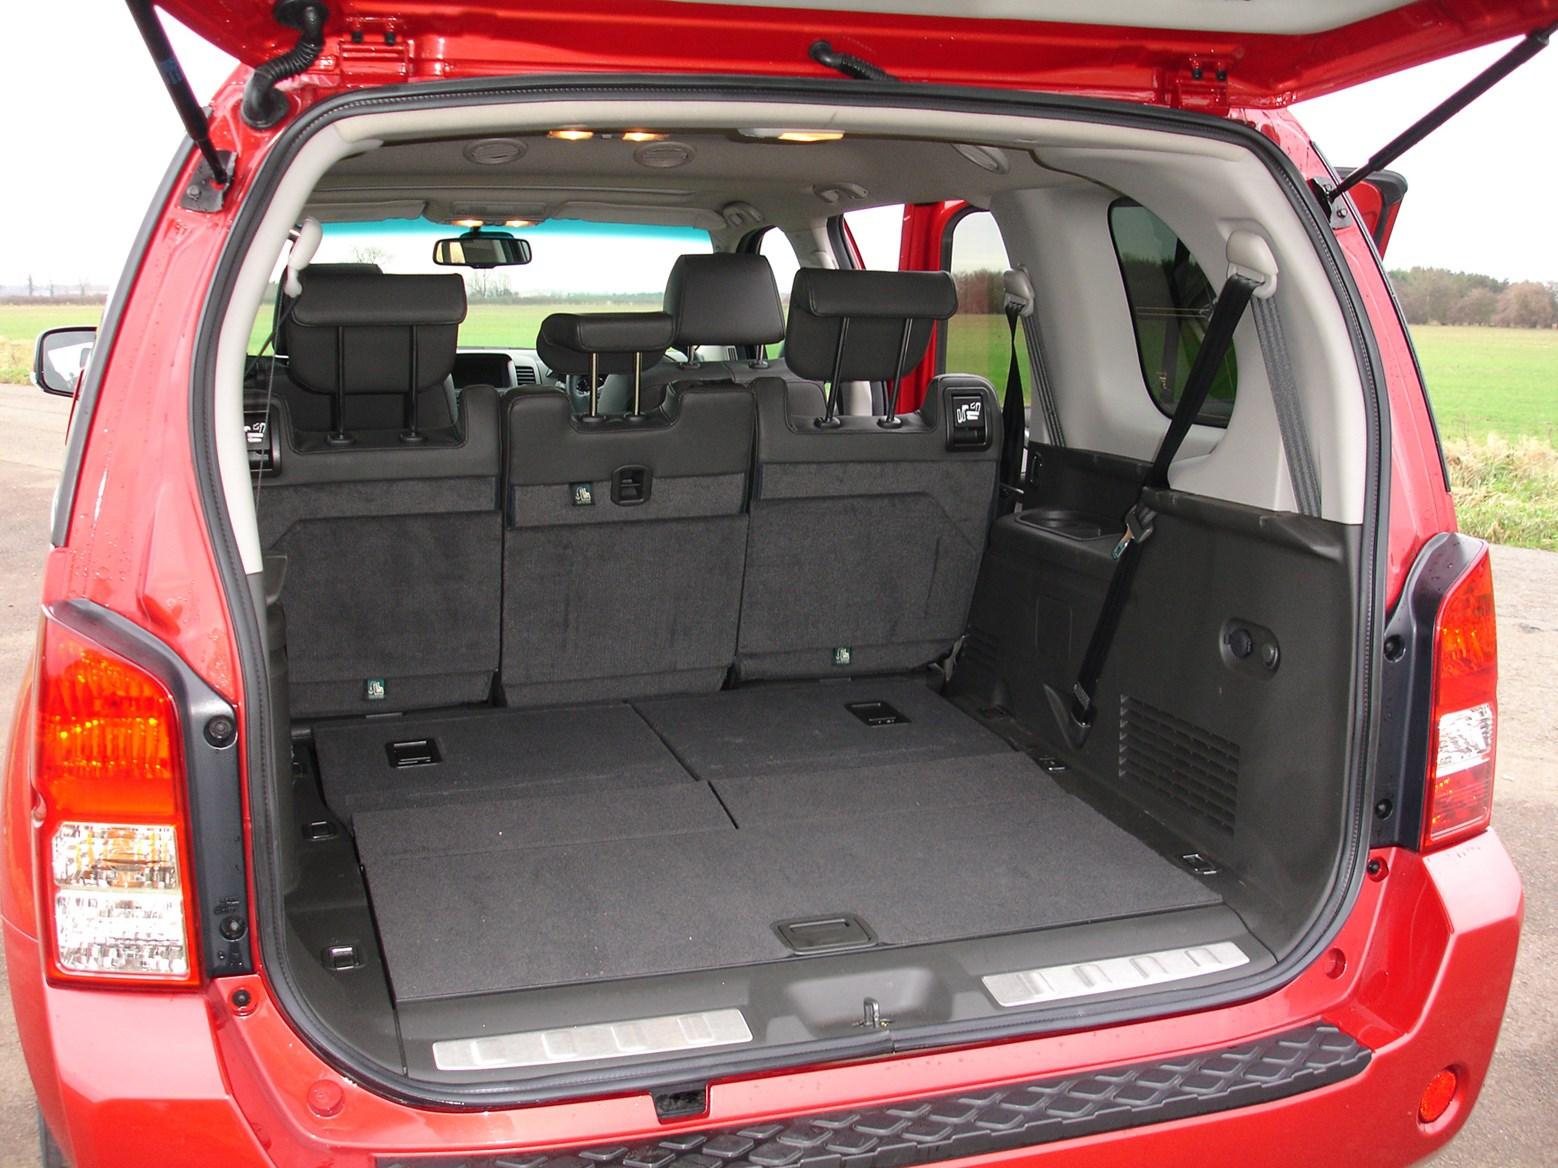 nissan pathfinder station wagon 2005 2014 photos parkers. Black Bedroom Furniture Sets. Home Design Ideas